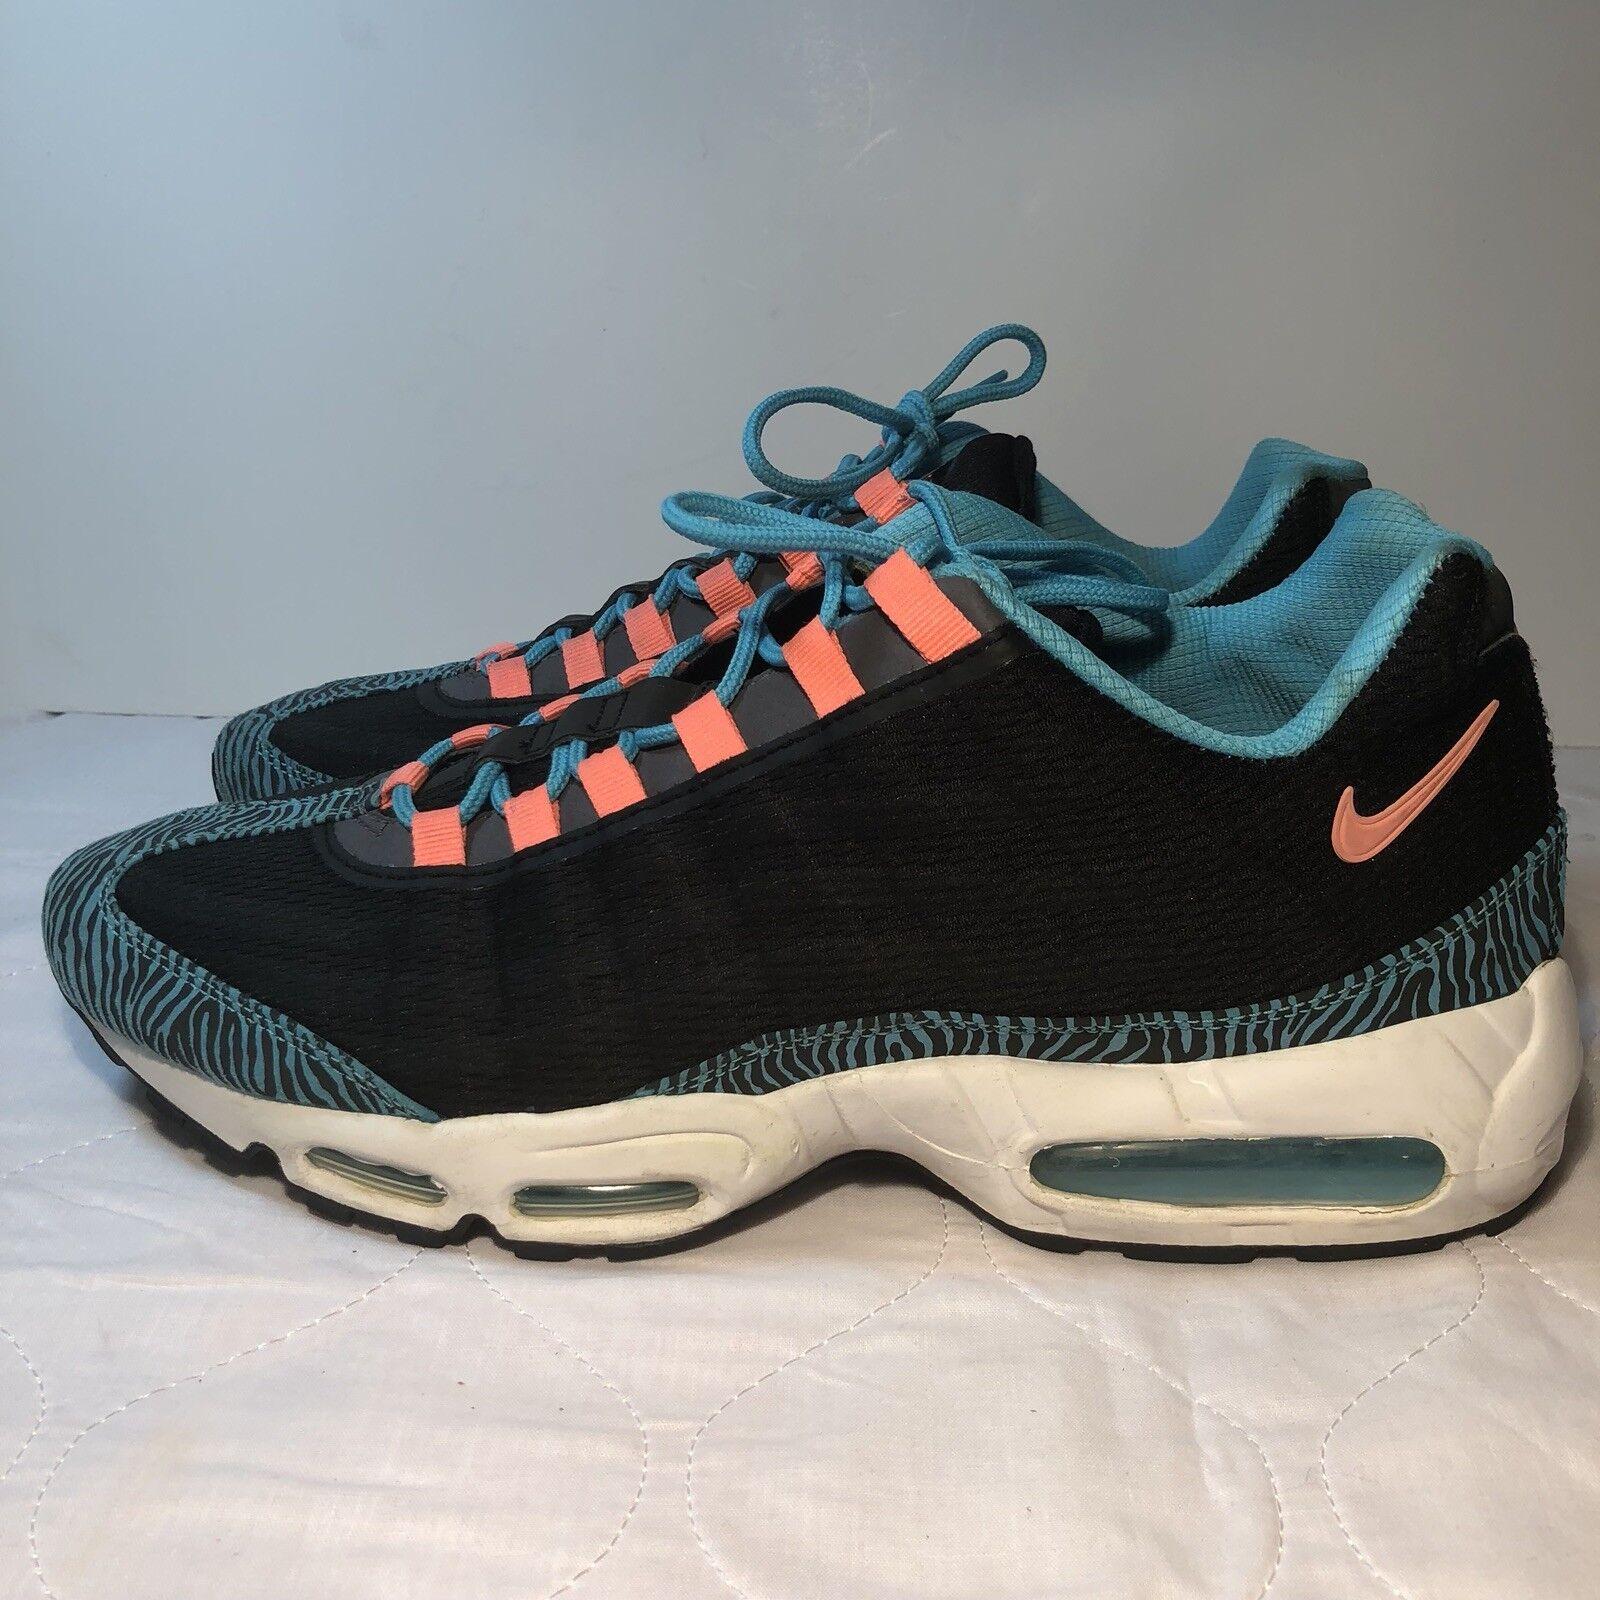 Nike Air Max 95 Premium Tape Mens US Sz 13 Black Pink-Gamma bluee-Grey 599425-064